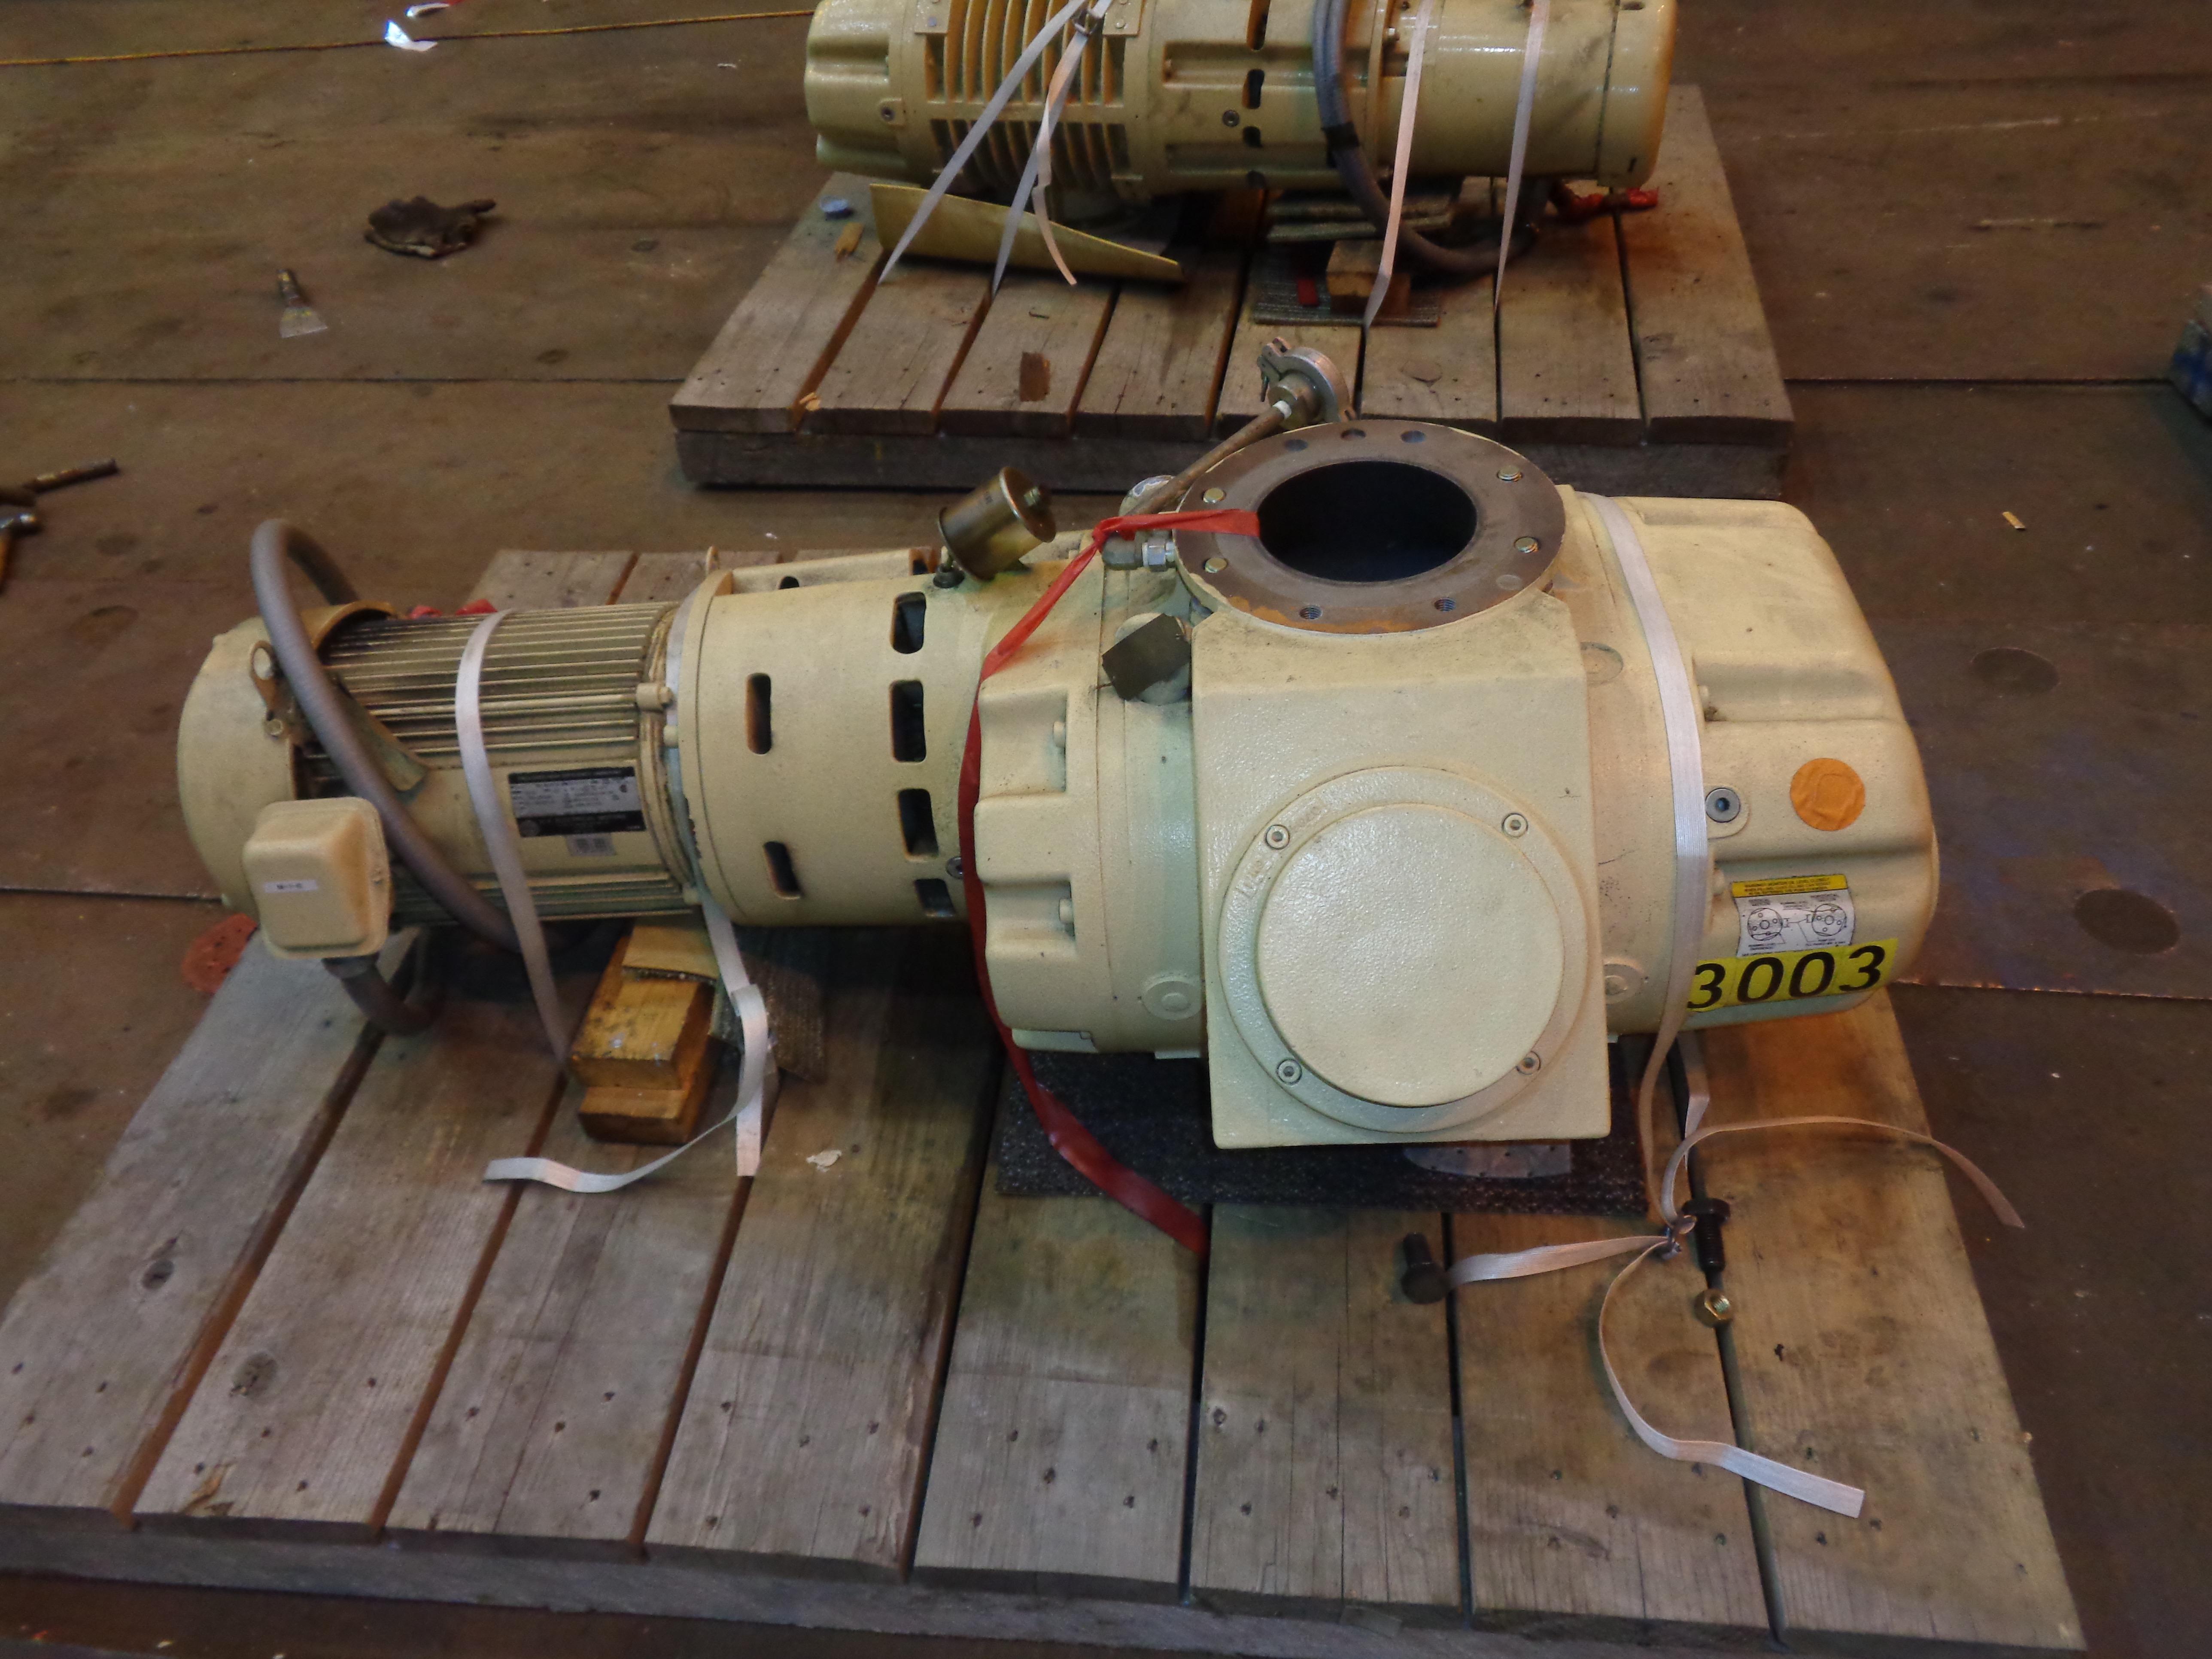 Lot of 3 Vacuum Pumps - Image 19 of 26